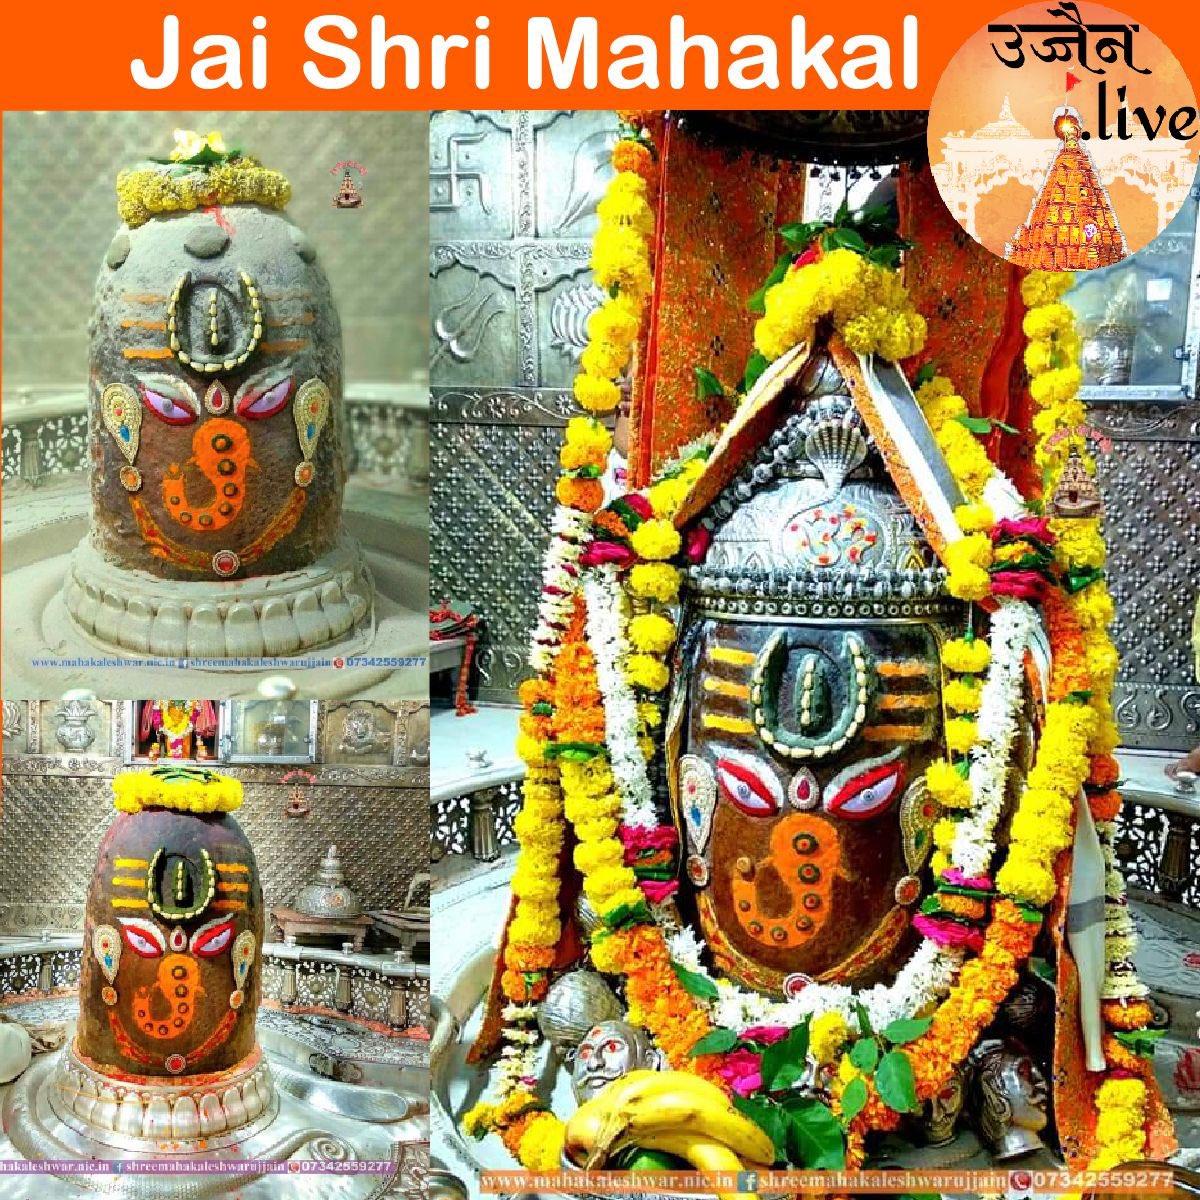 Oct 21: Bhasma Aarti darshan of Shree #Mahakaleshwar #Ujjain #shiv #shiva #bholenath #mahadev #हर_हर_महादेव #jaibholenath #jaimahakal #om #omnamahshivay #harharmahadev  #mahakal #goodmorning #WednesdayVibes  #Incredibleindia  @HinduTempleLive @BharatTemples_ https://t.co/19aSKAOODx